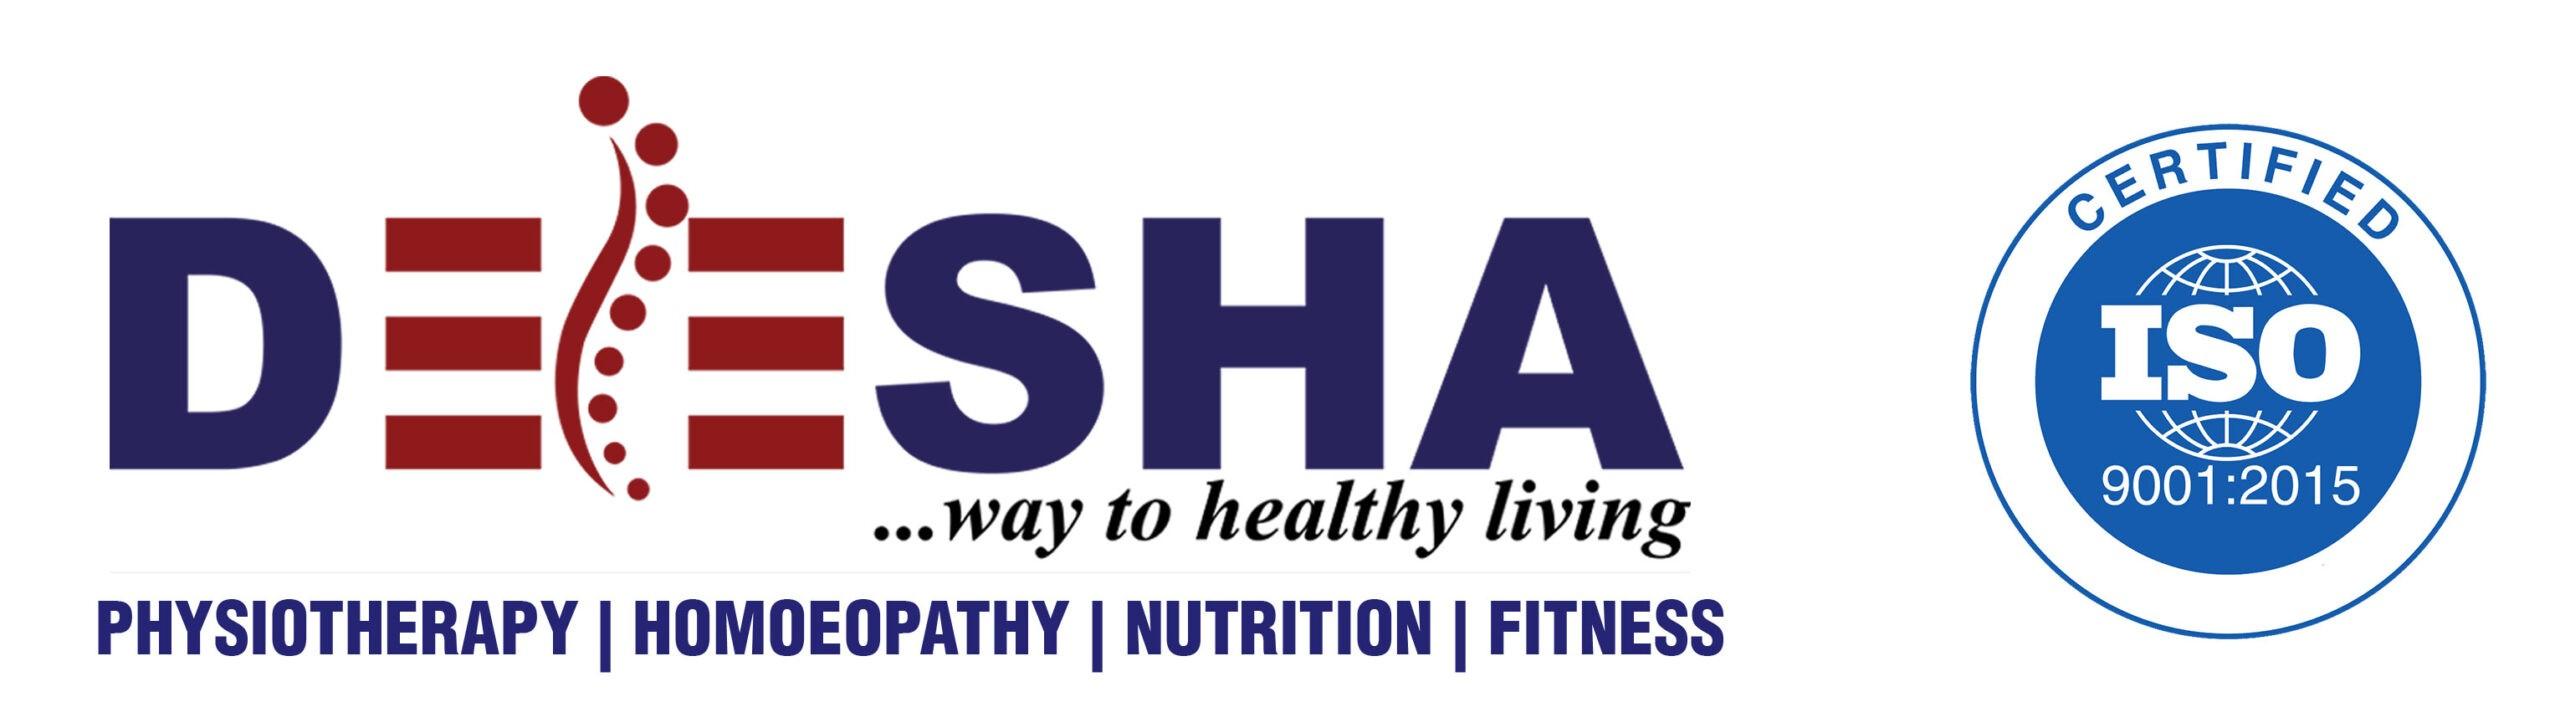 DEESHA HEALTHCARE